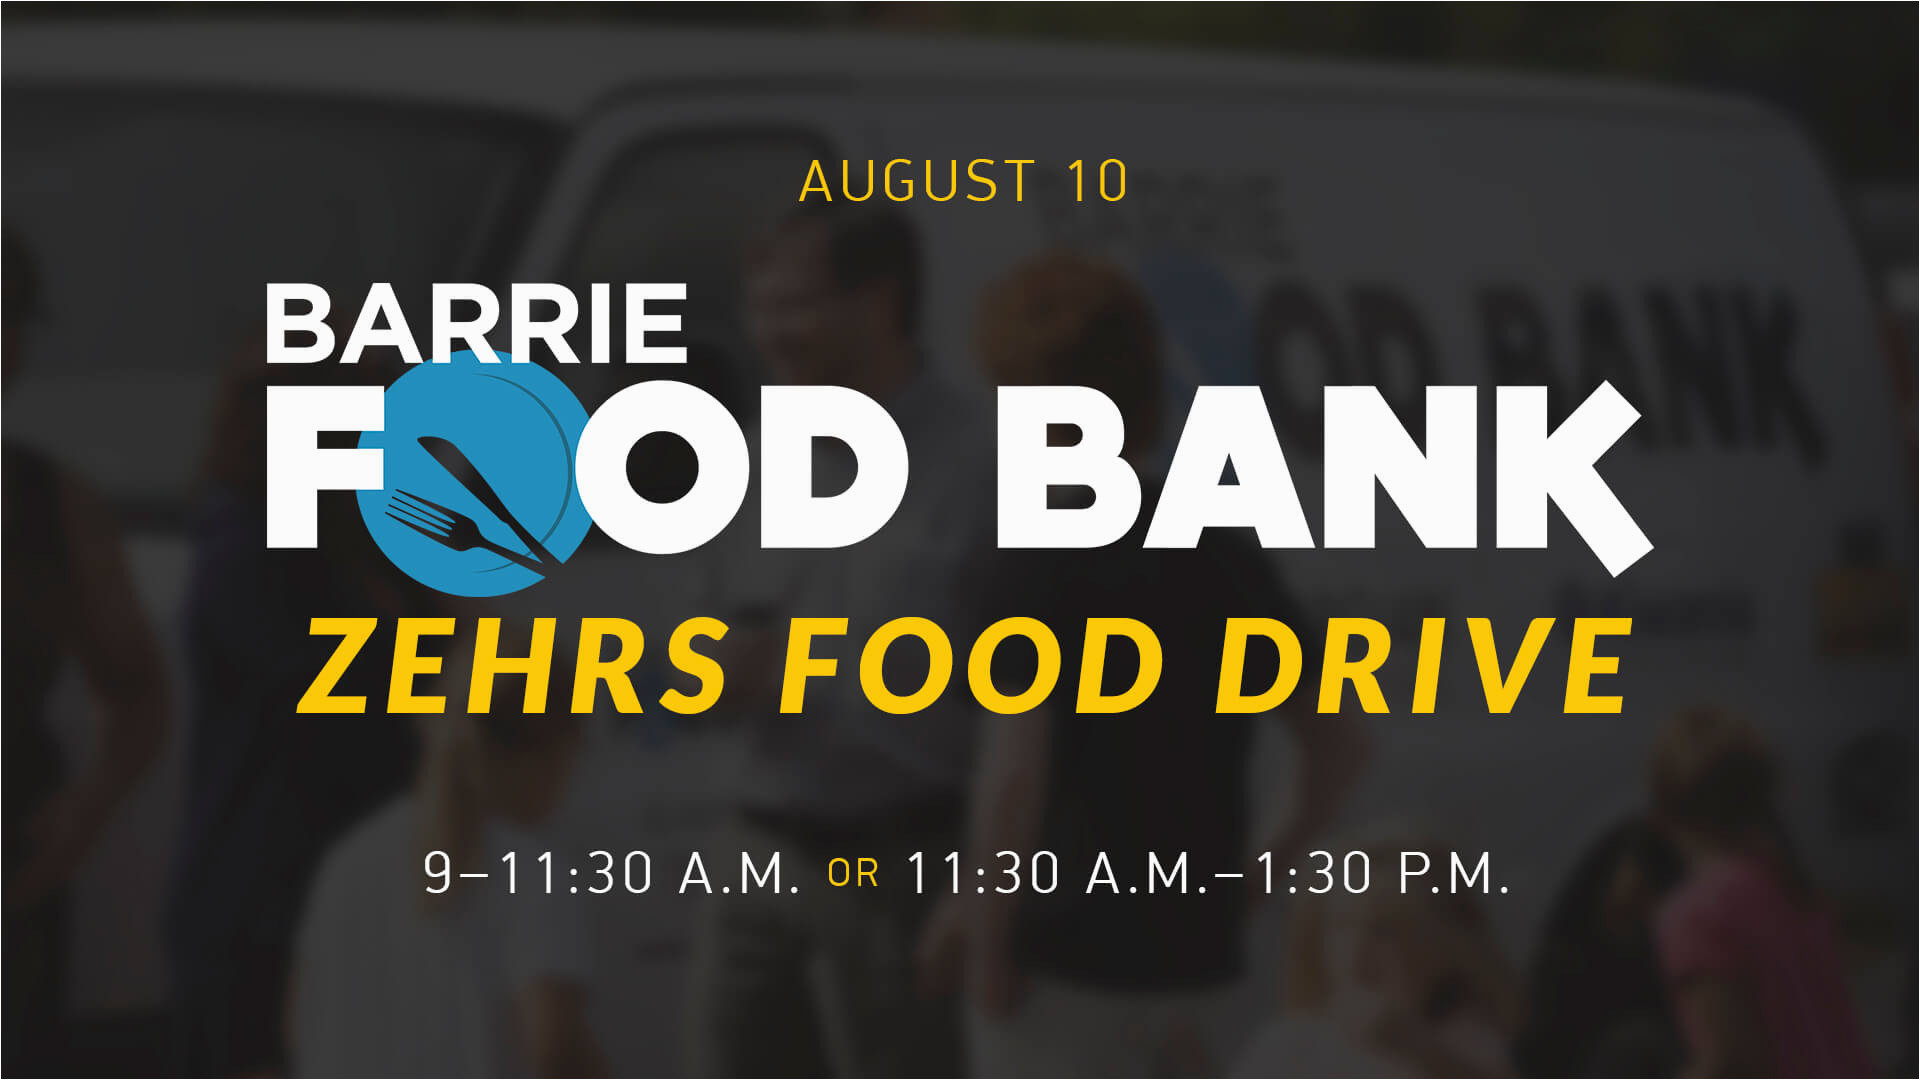 barrie food bank zehrs food drive harvest bible chapel